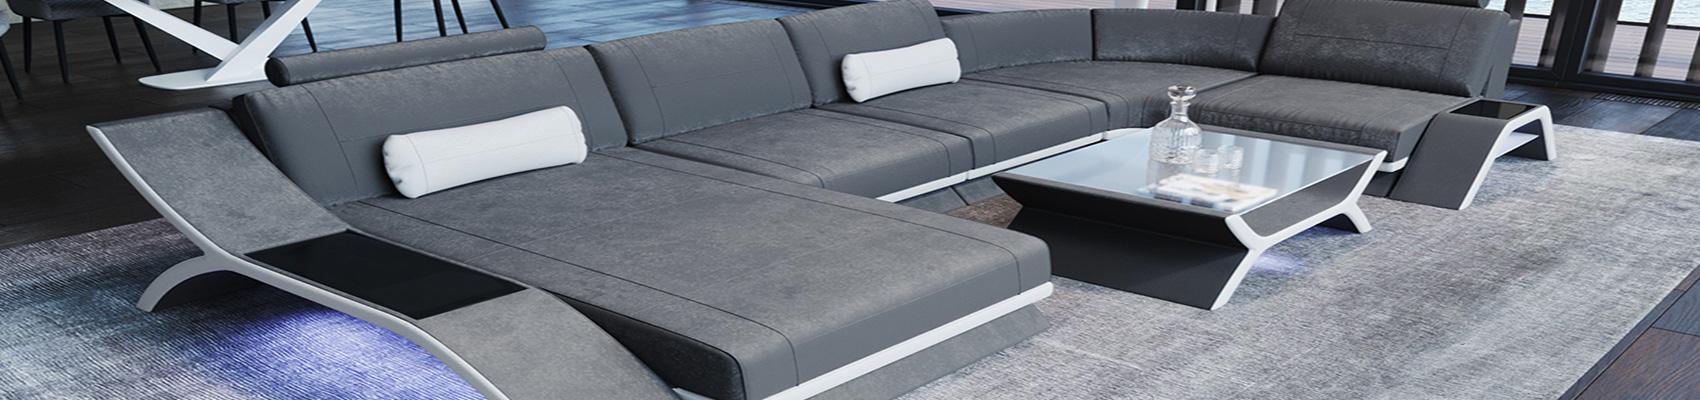 Store stof sektions sofaer